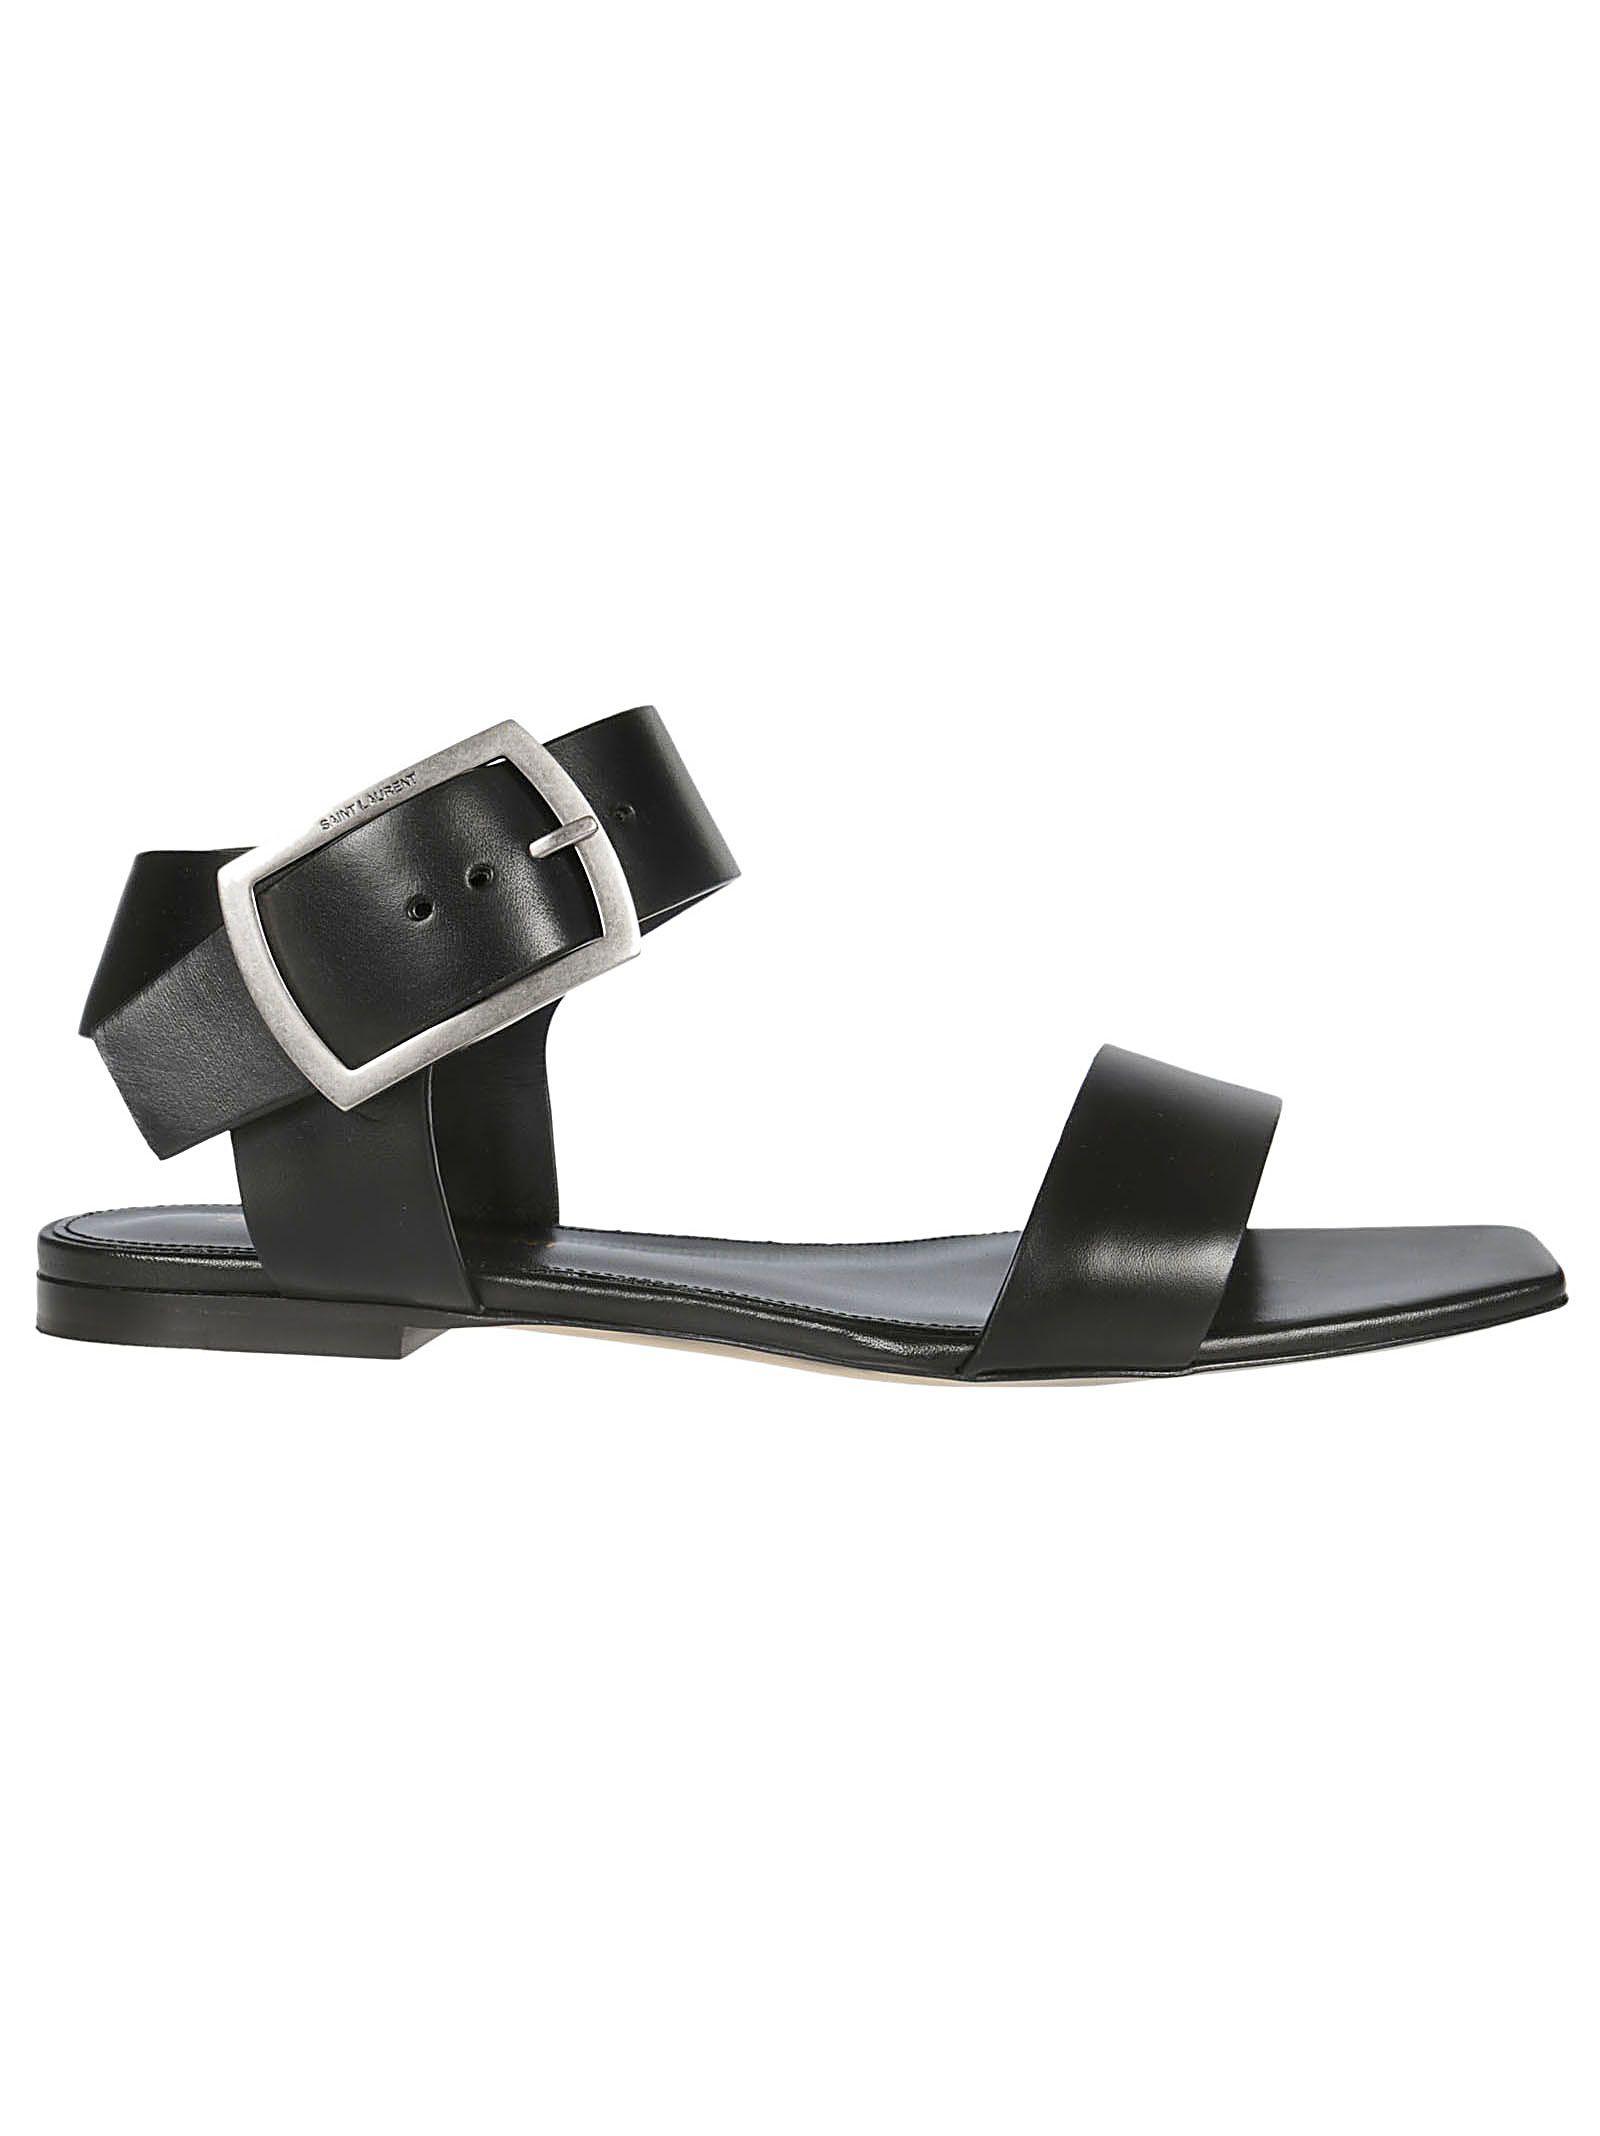 Saint Laurent Flat Sandals In Black